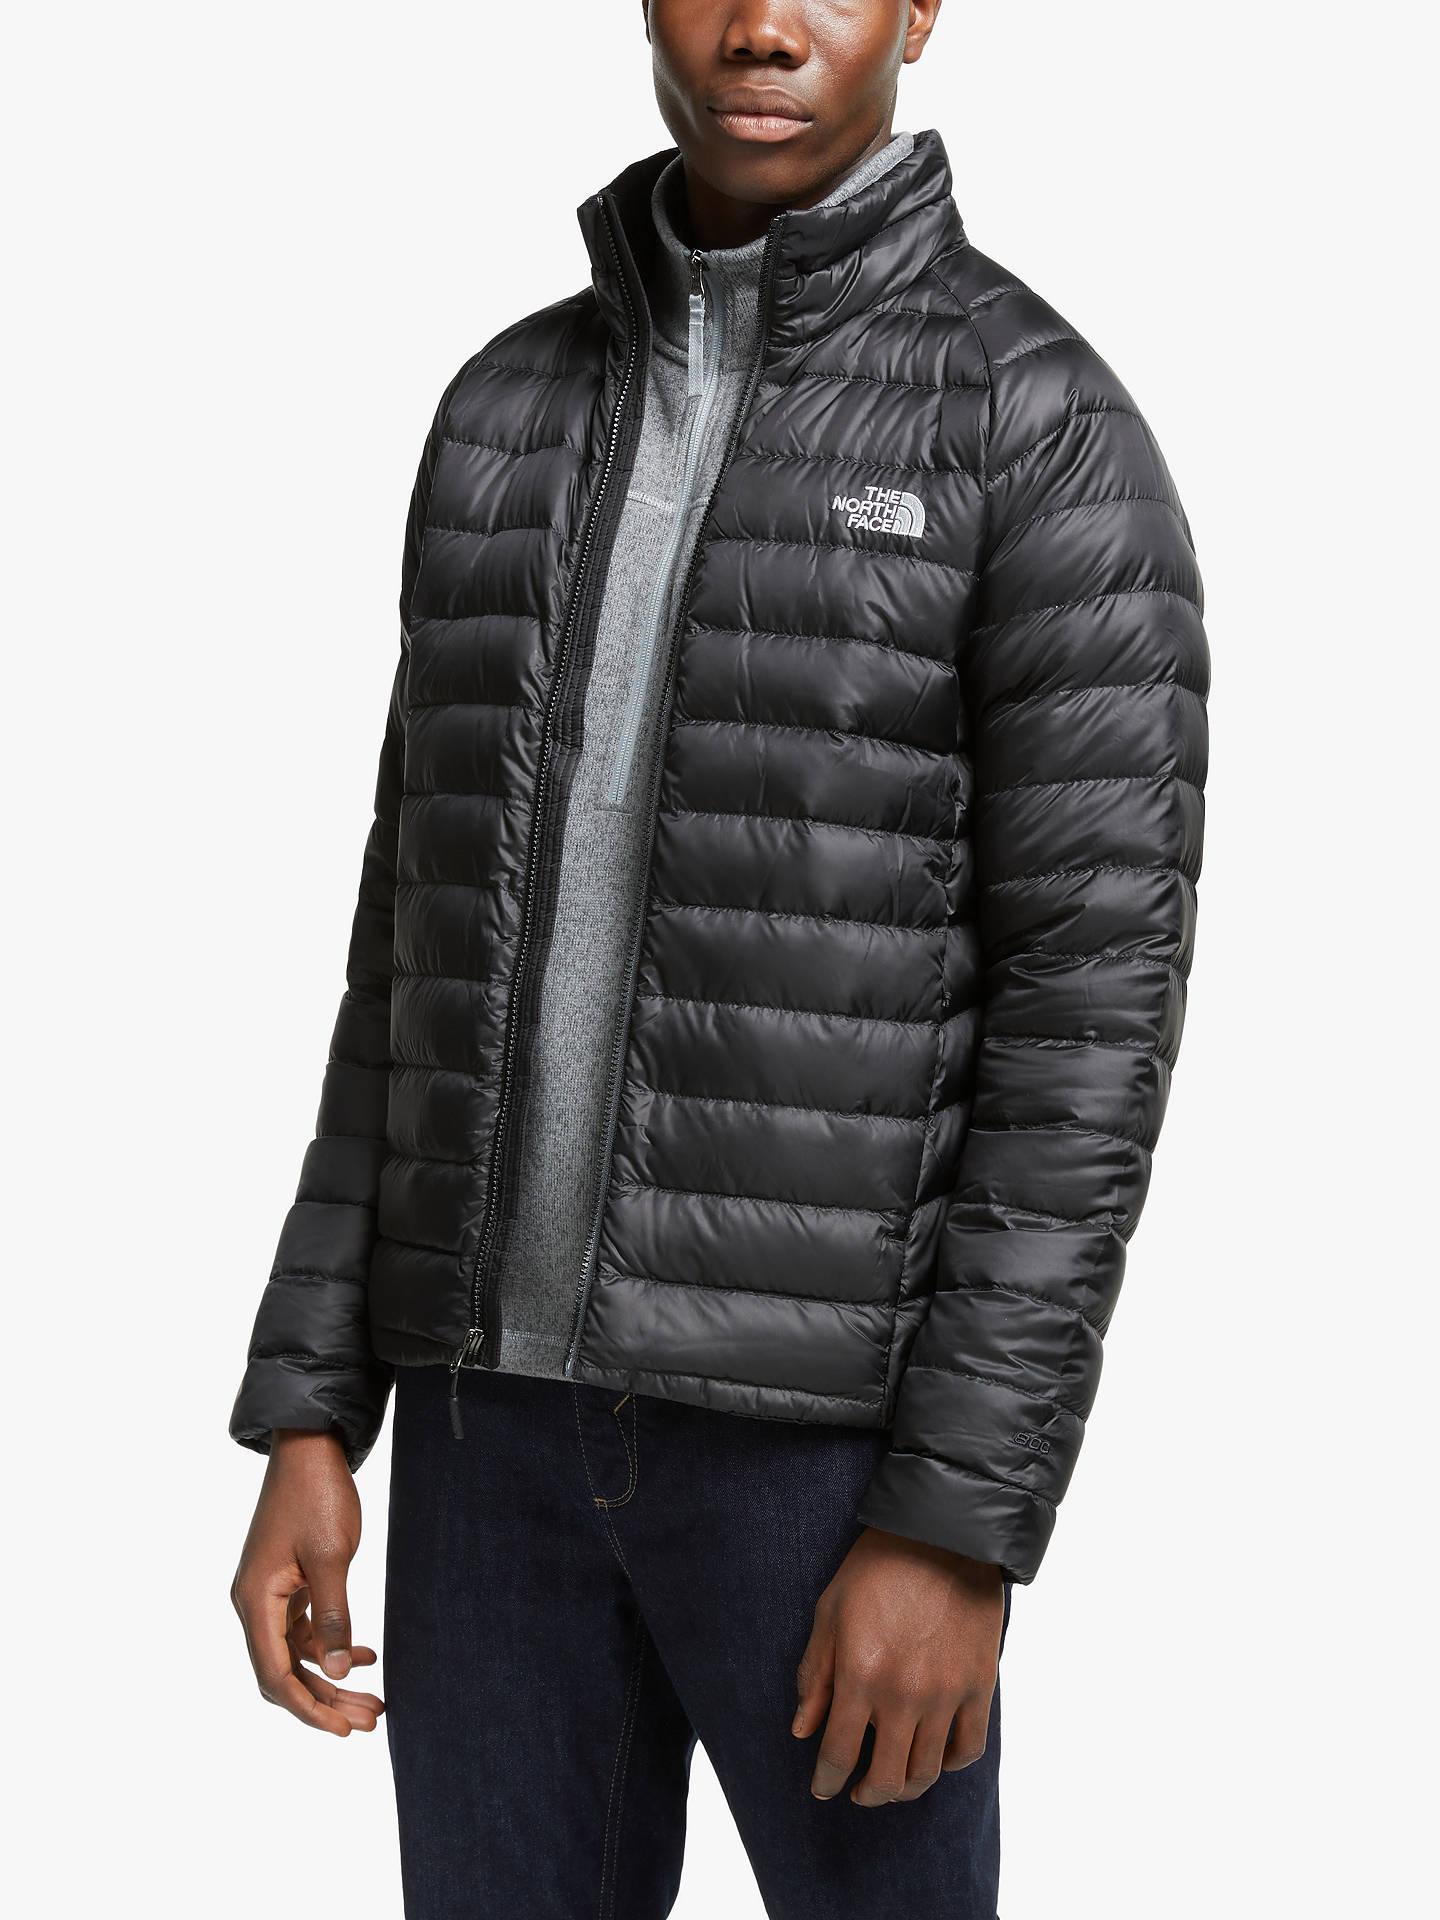 649594055328 Buy The North Face Men s Waterproof Trevail Jacket